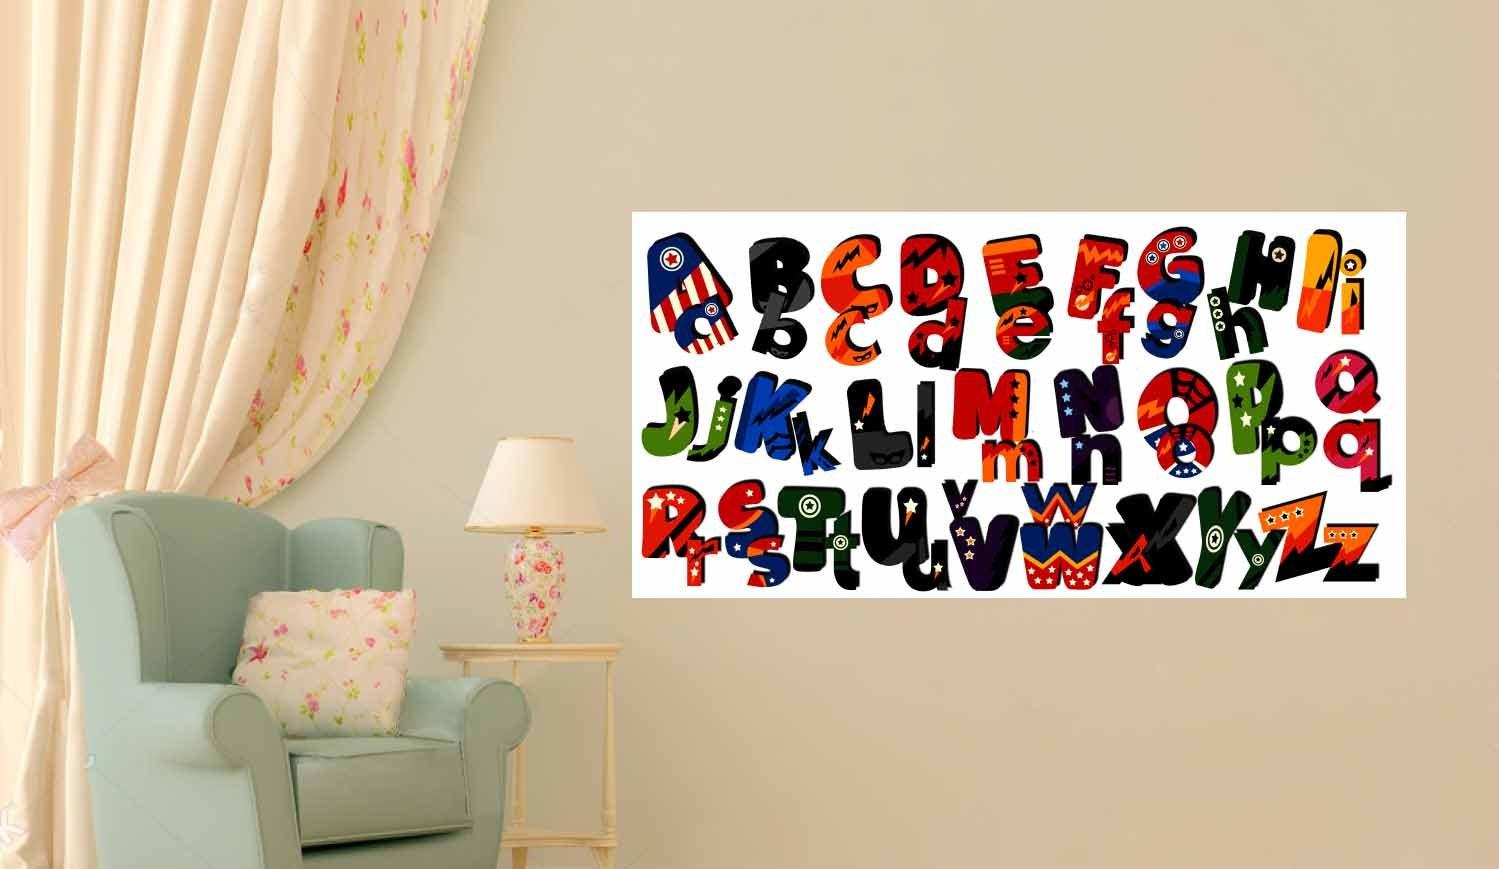 Superheros Alphabet Wall Art,Superhero Alphabet,Colorful Alphabet,Kids Room  Art,Nursery Room Art,Kidu0027s Room Poster,Superhero Poster,Alphabet